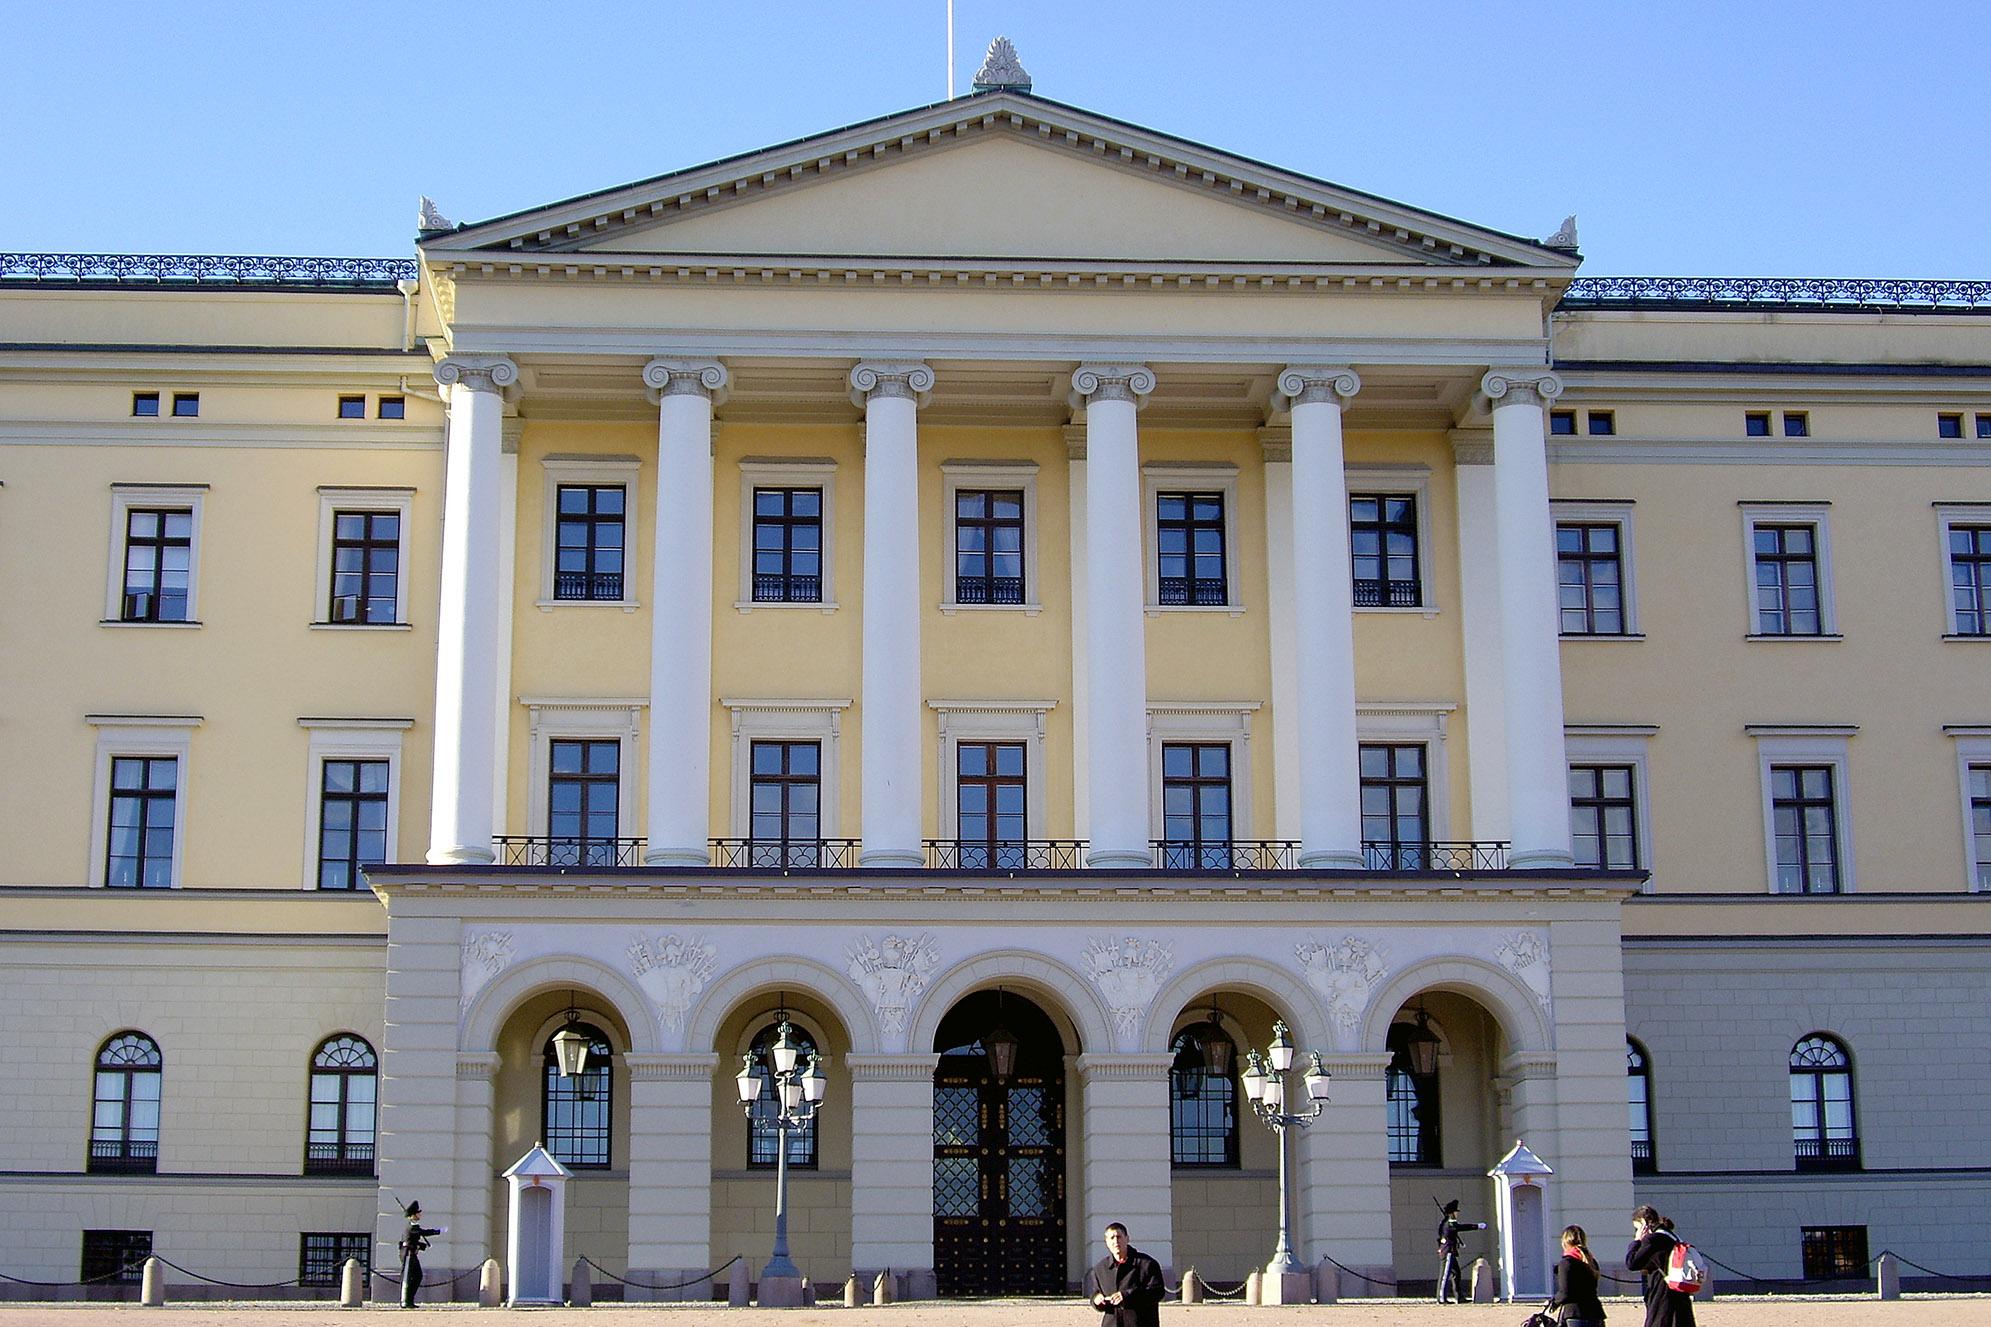 Kungliga slottet Oslo